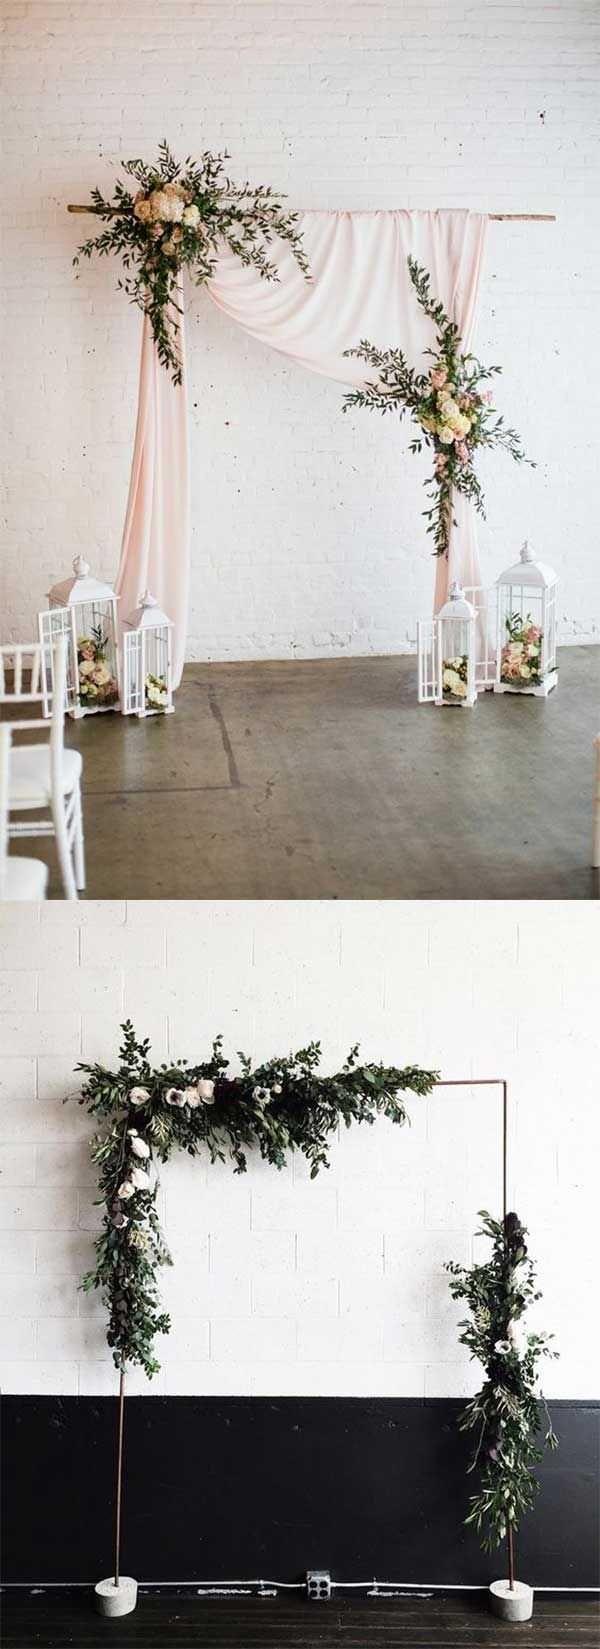 27 ideas para decorar tu boda perfecta detalles para boda y - Detalles para una boda perfecta ...